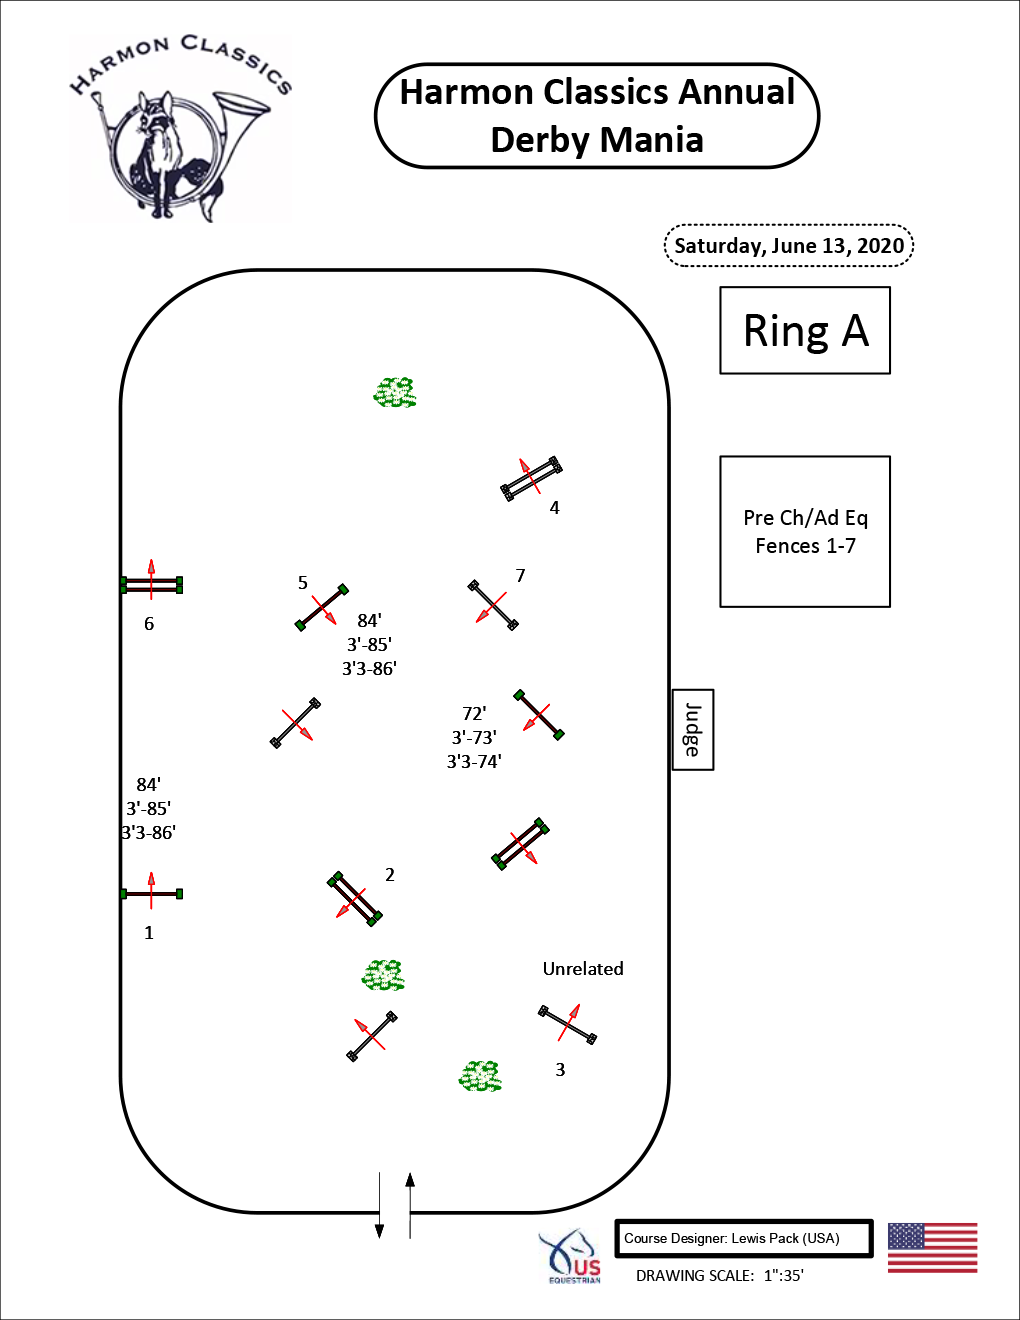 Ring-A-Saturday6-13-Pre-Child-Adult-Equitation-Harmon-Classics-Derby-Mania